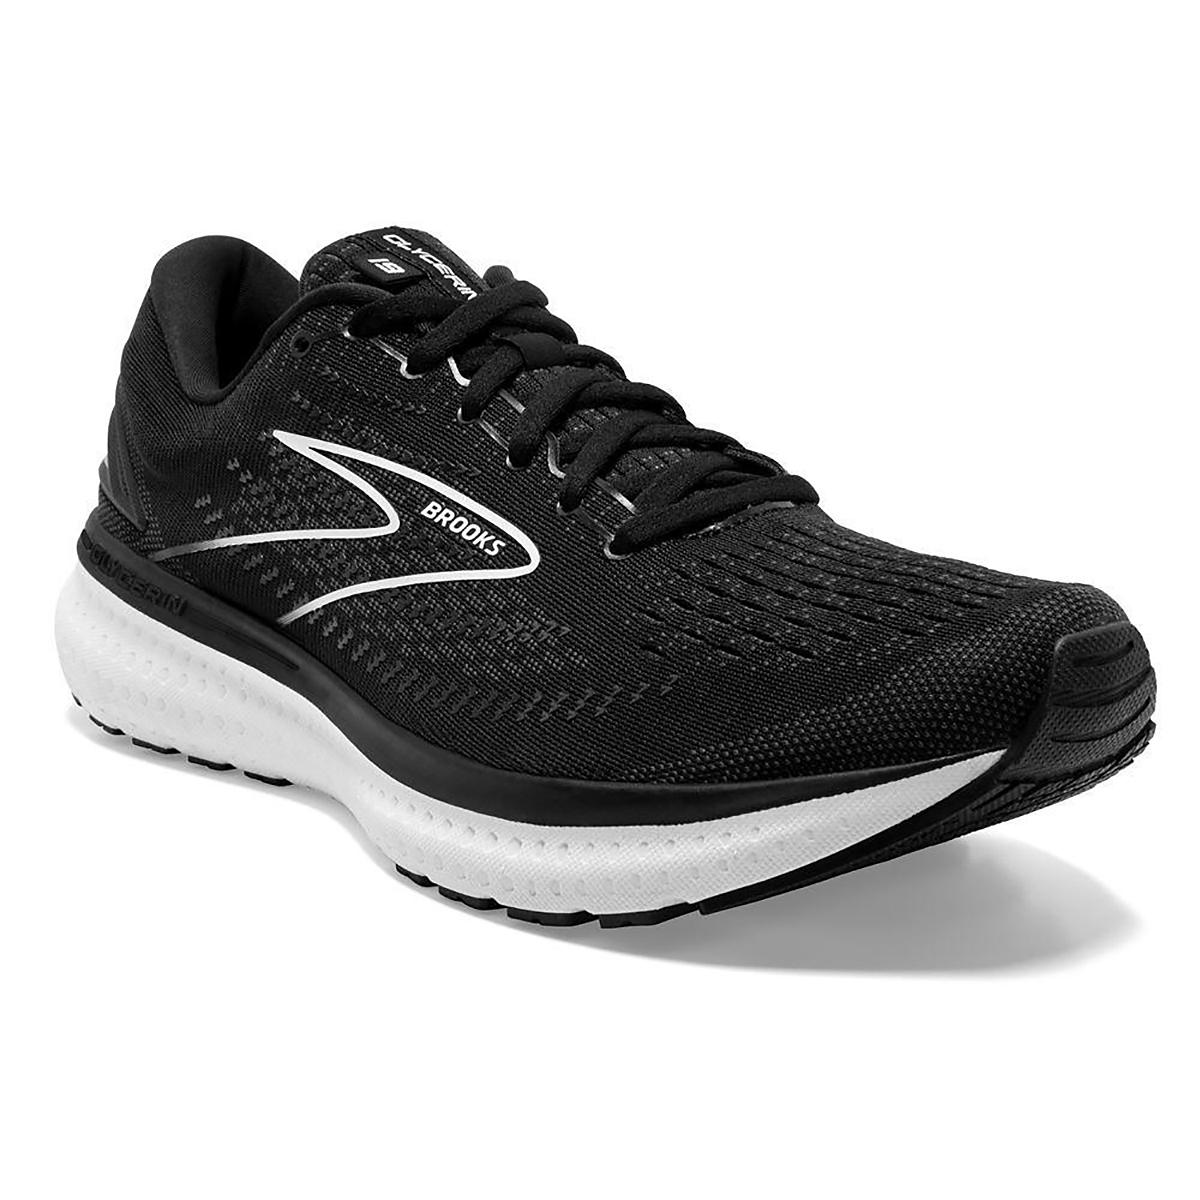 Men's Brooks Glycerin 19 Running Shoe - Color: Black/White - Size: 7 - Width: Regular, Black/White, large, image 3